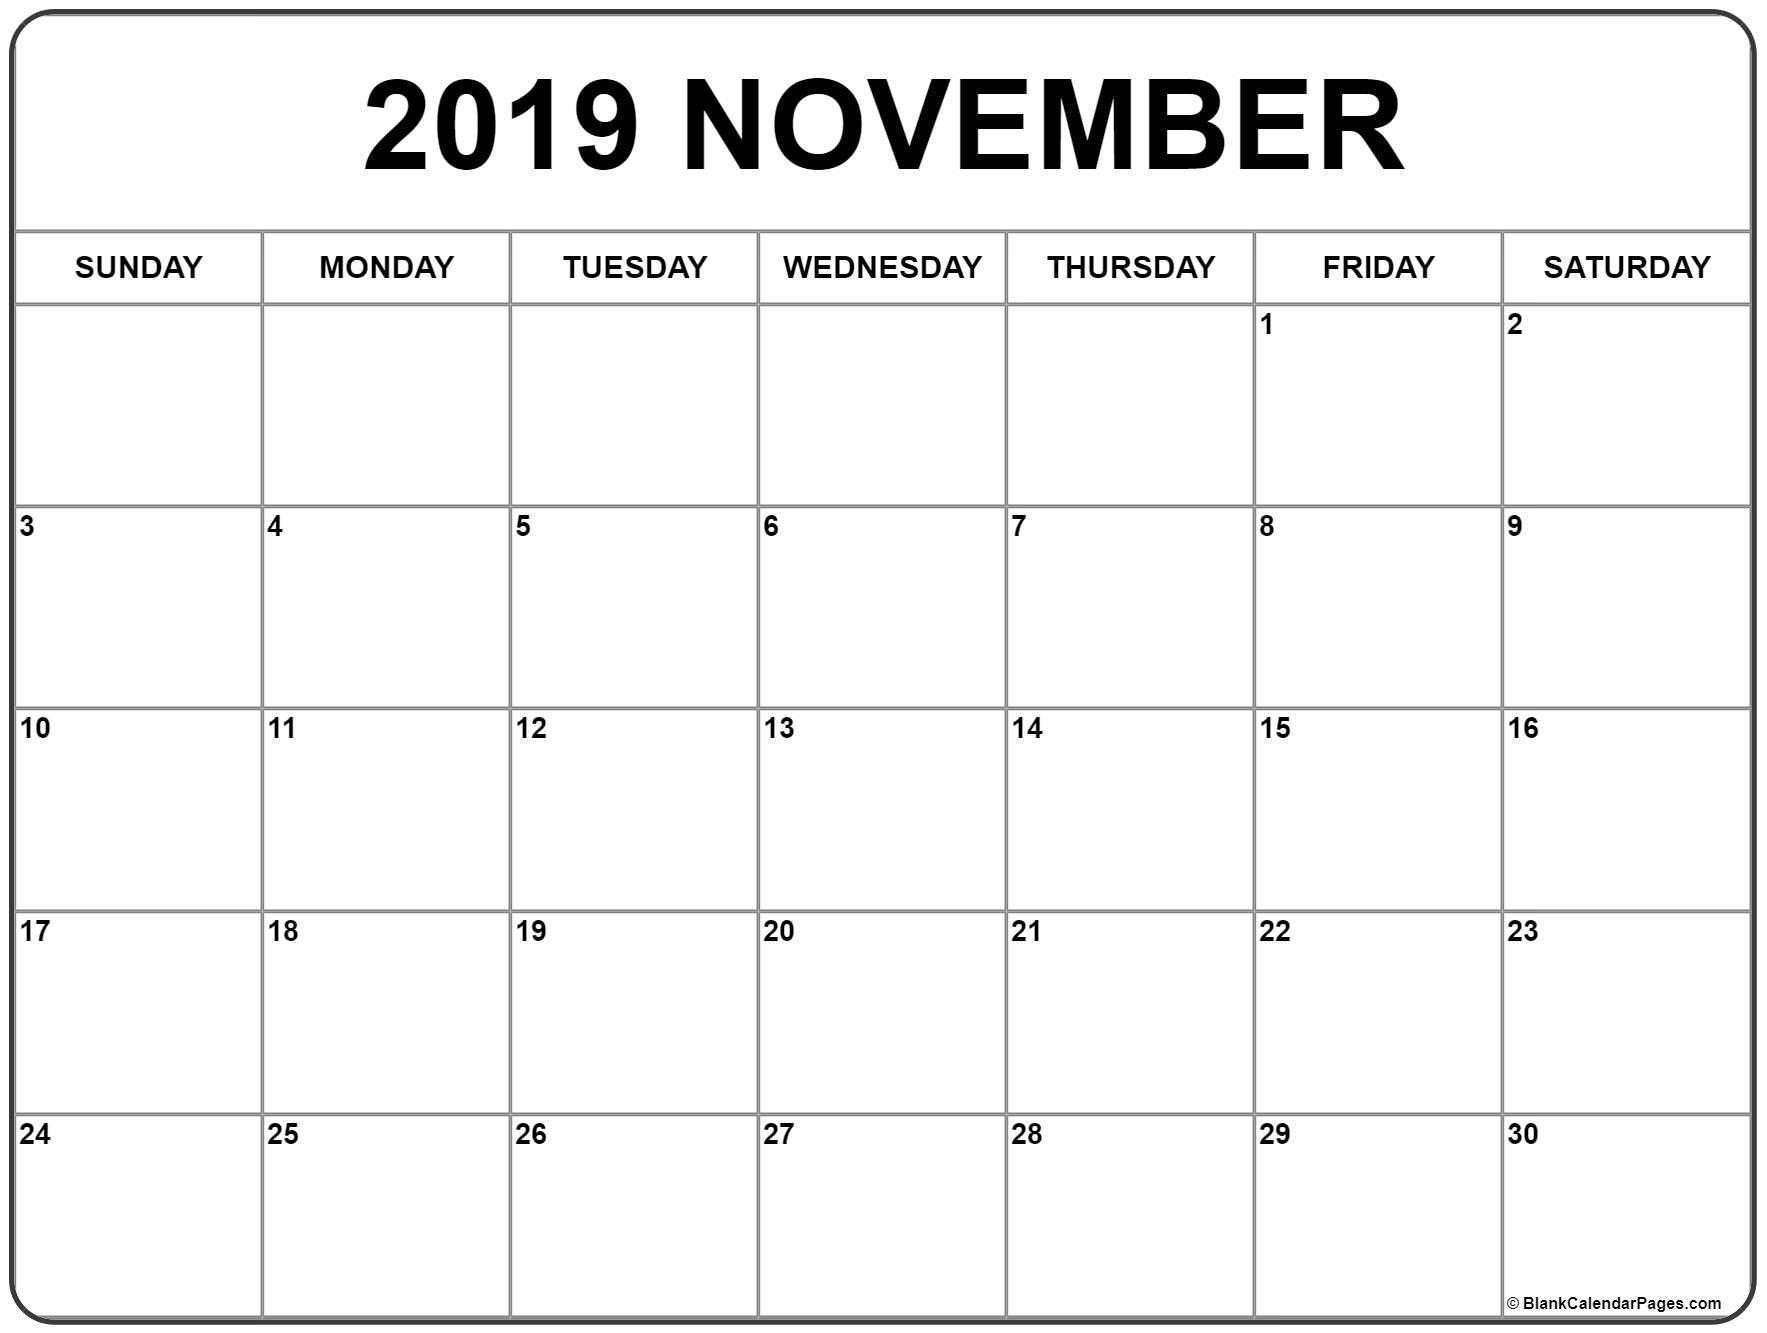 November 2019 Calendar In 2019 | Printable Blank Calendar